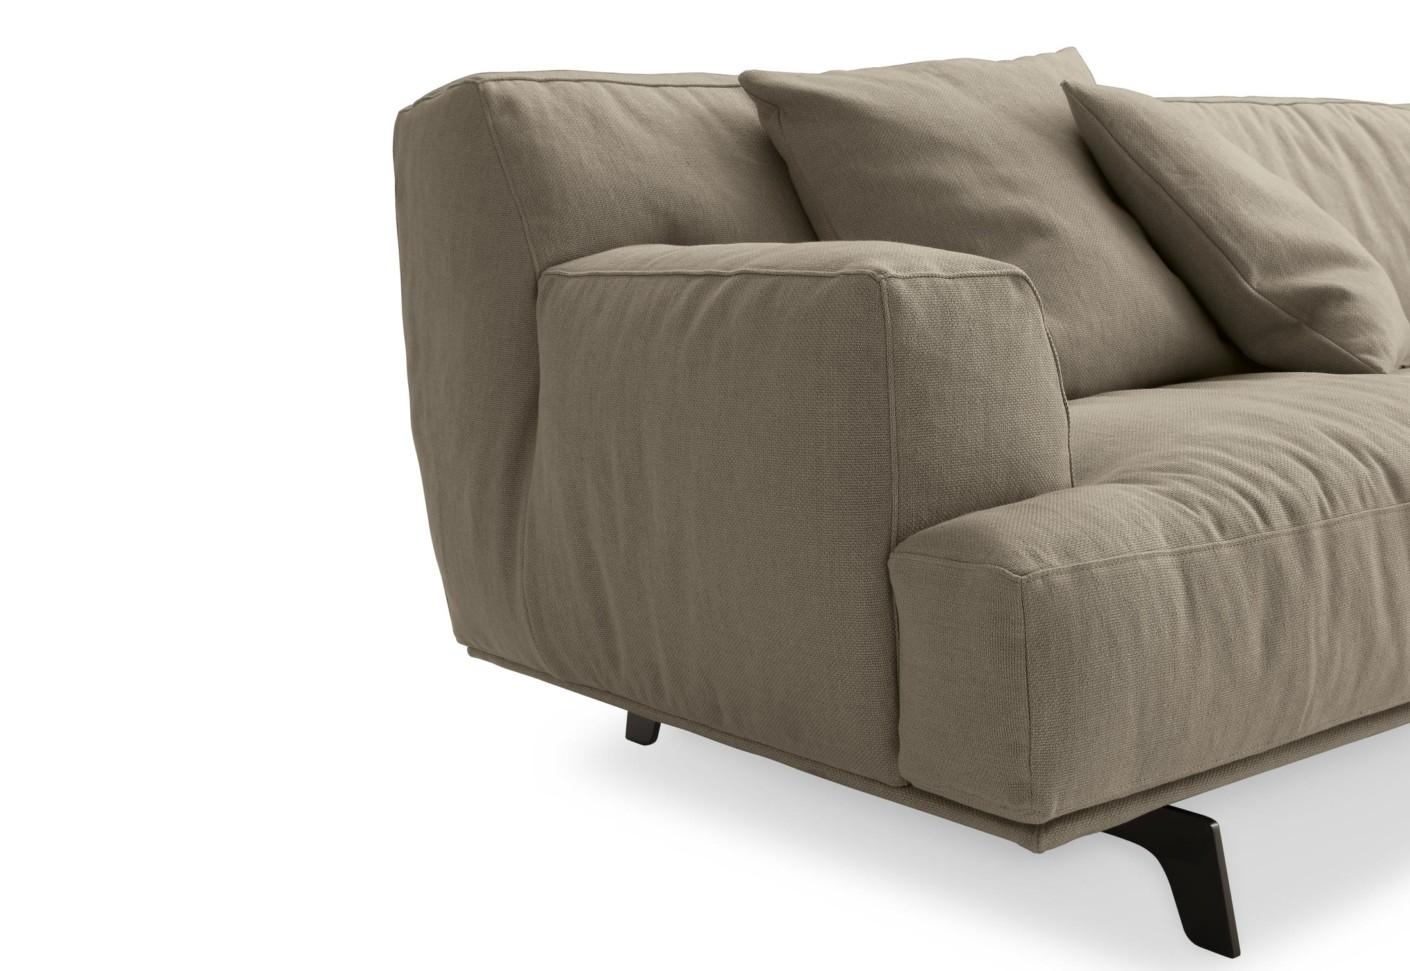 california sofa mfg the leather company uk tribeca by poliform stylepark